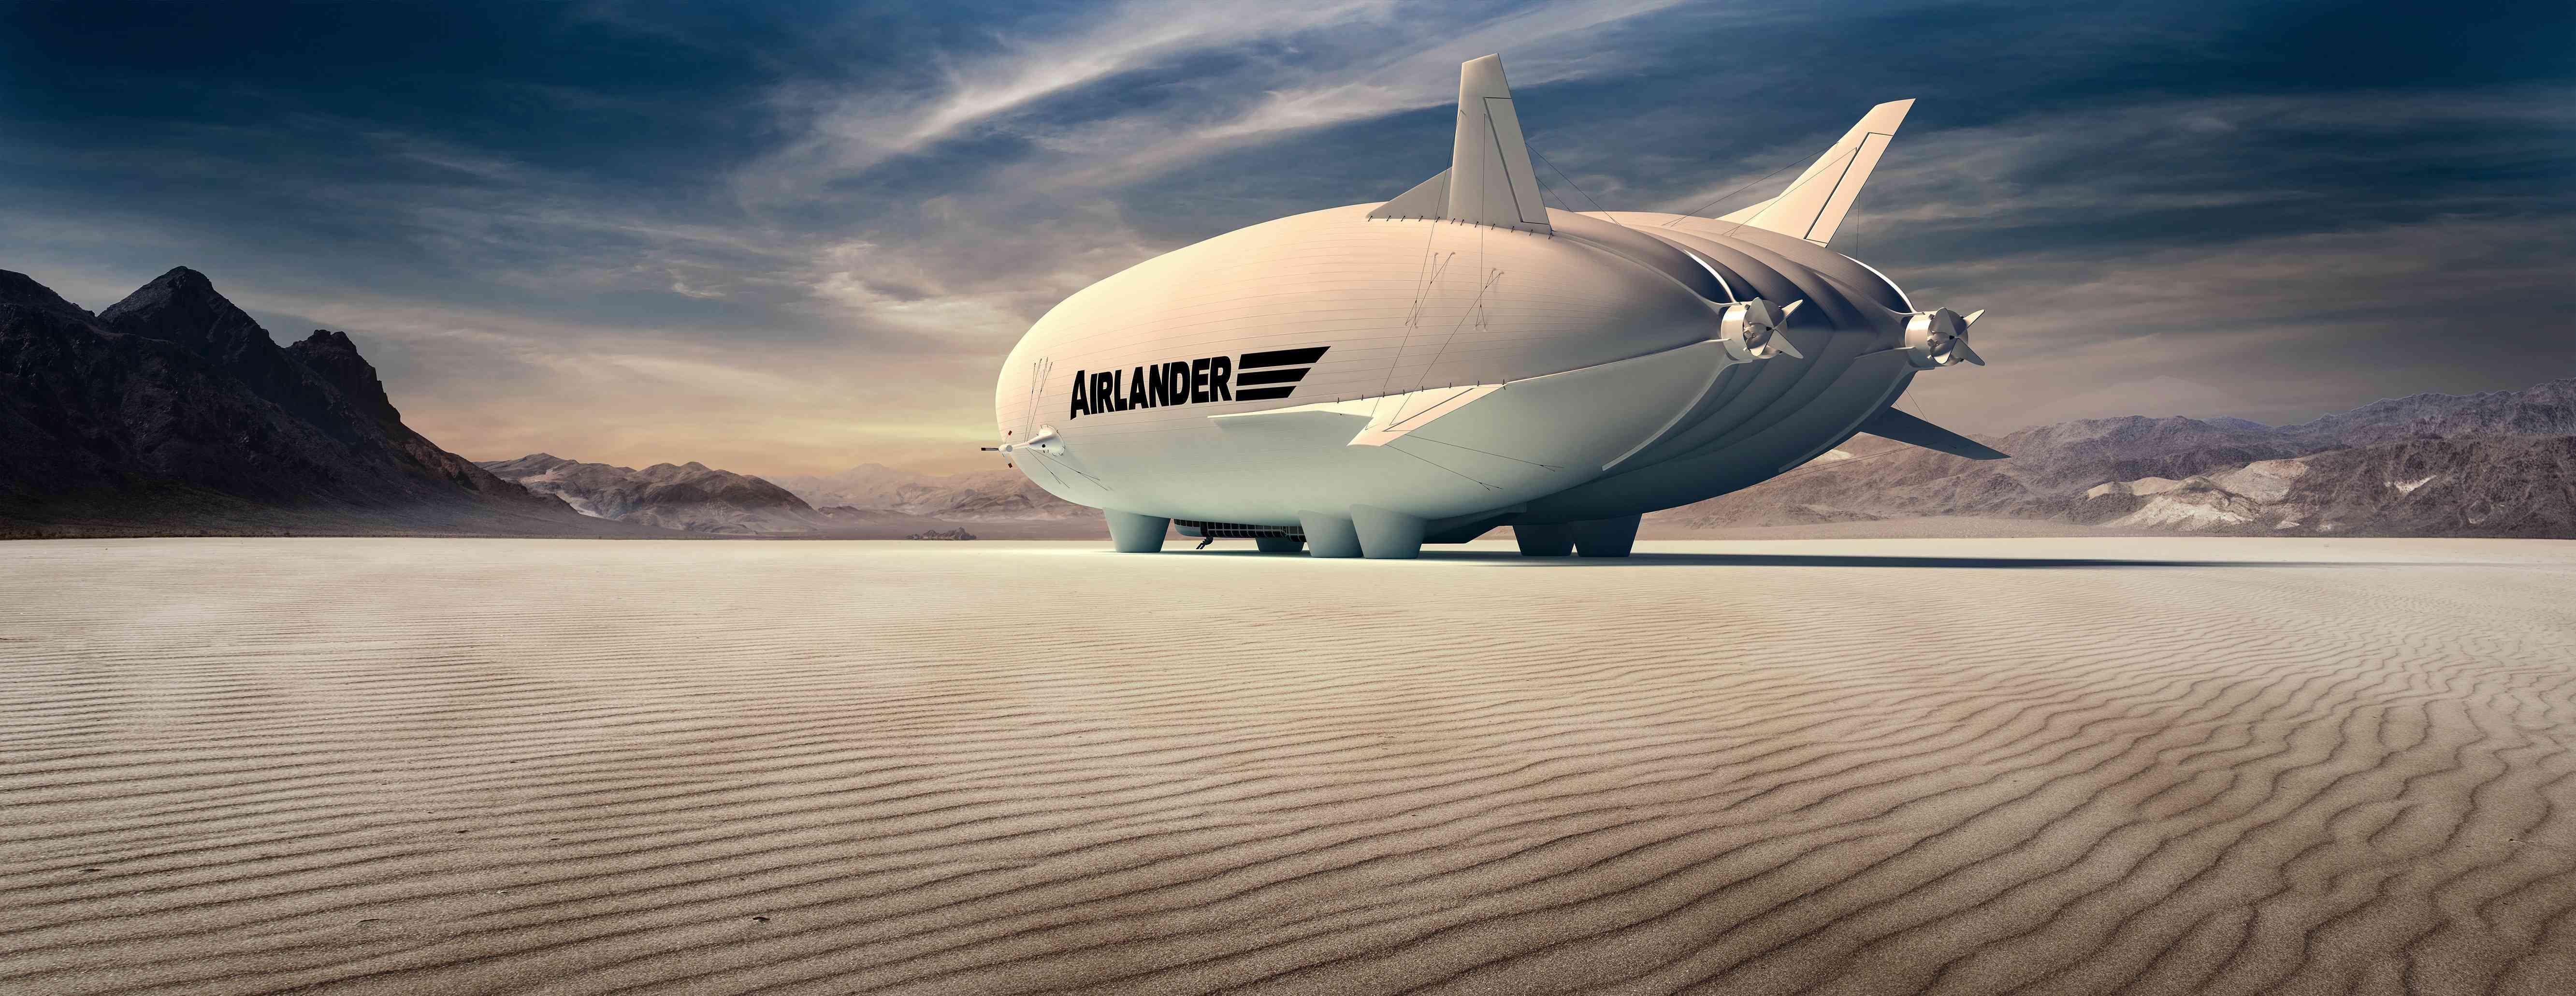 Airlander 10 on the beach